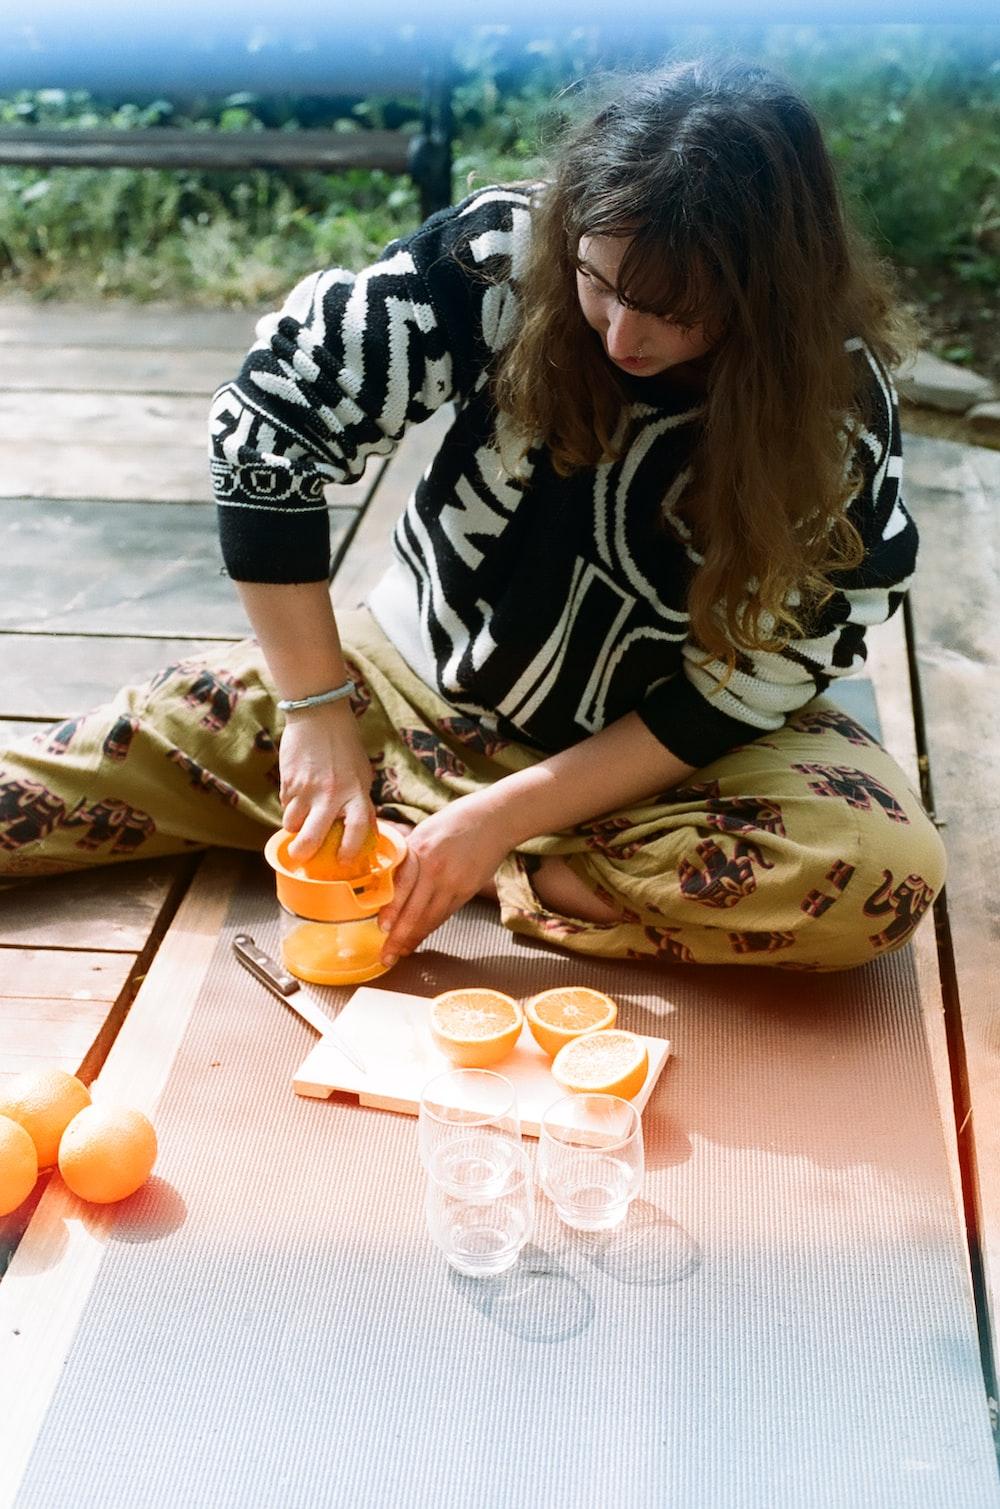 woman in black and white shirt holding orange fruit